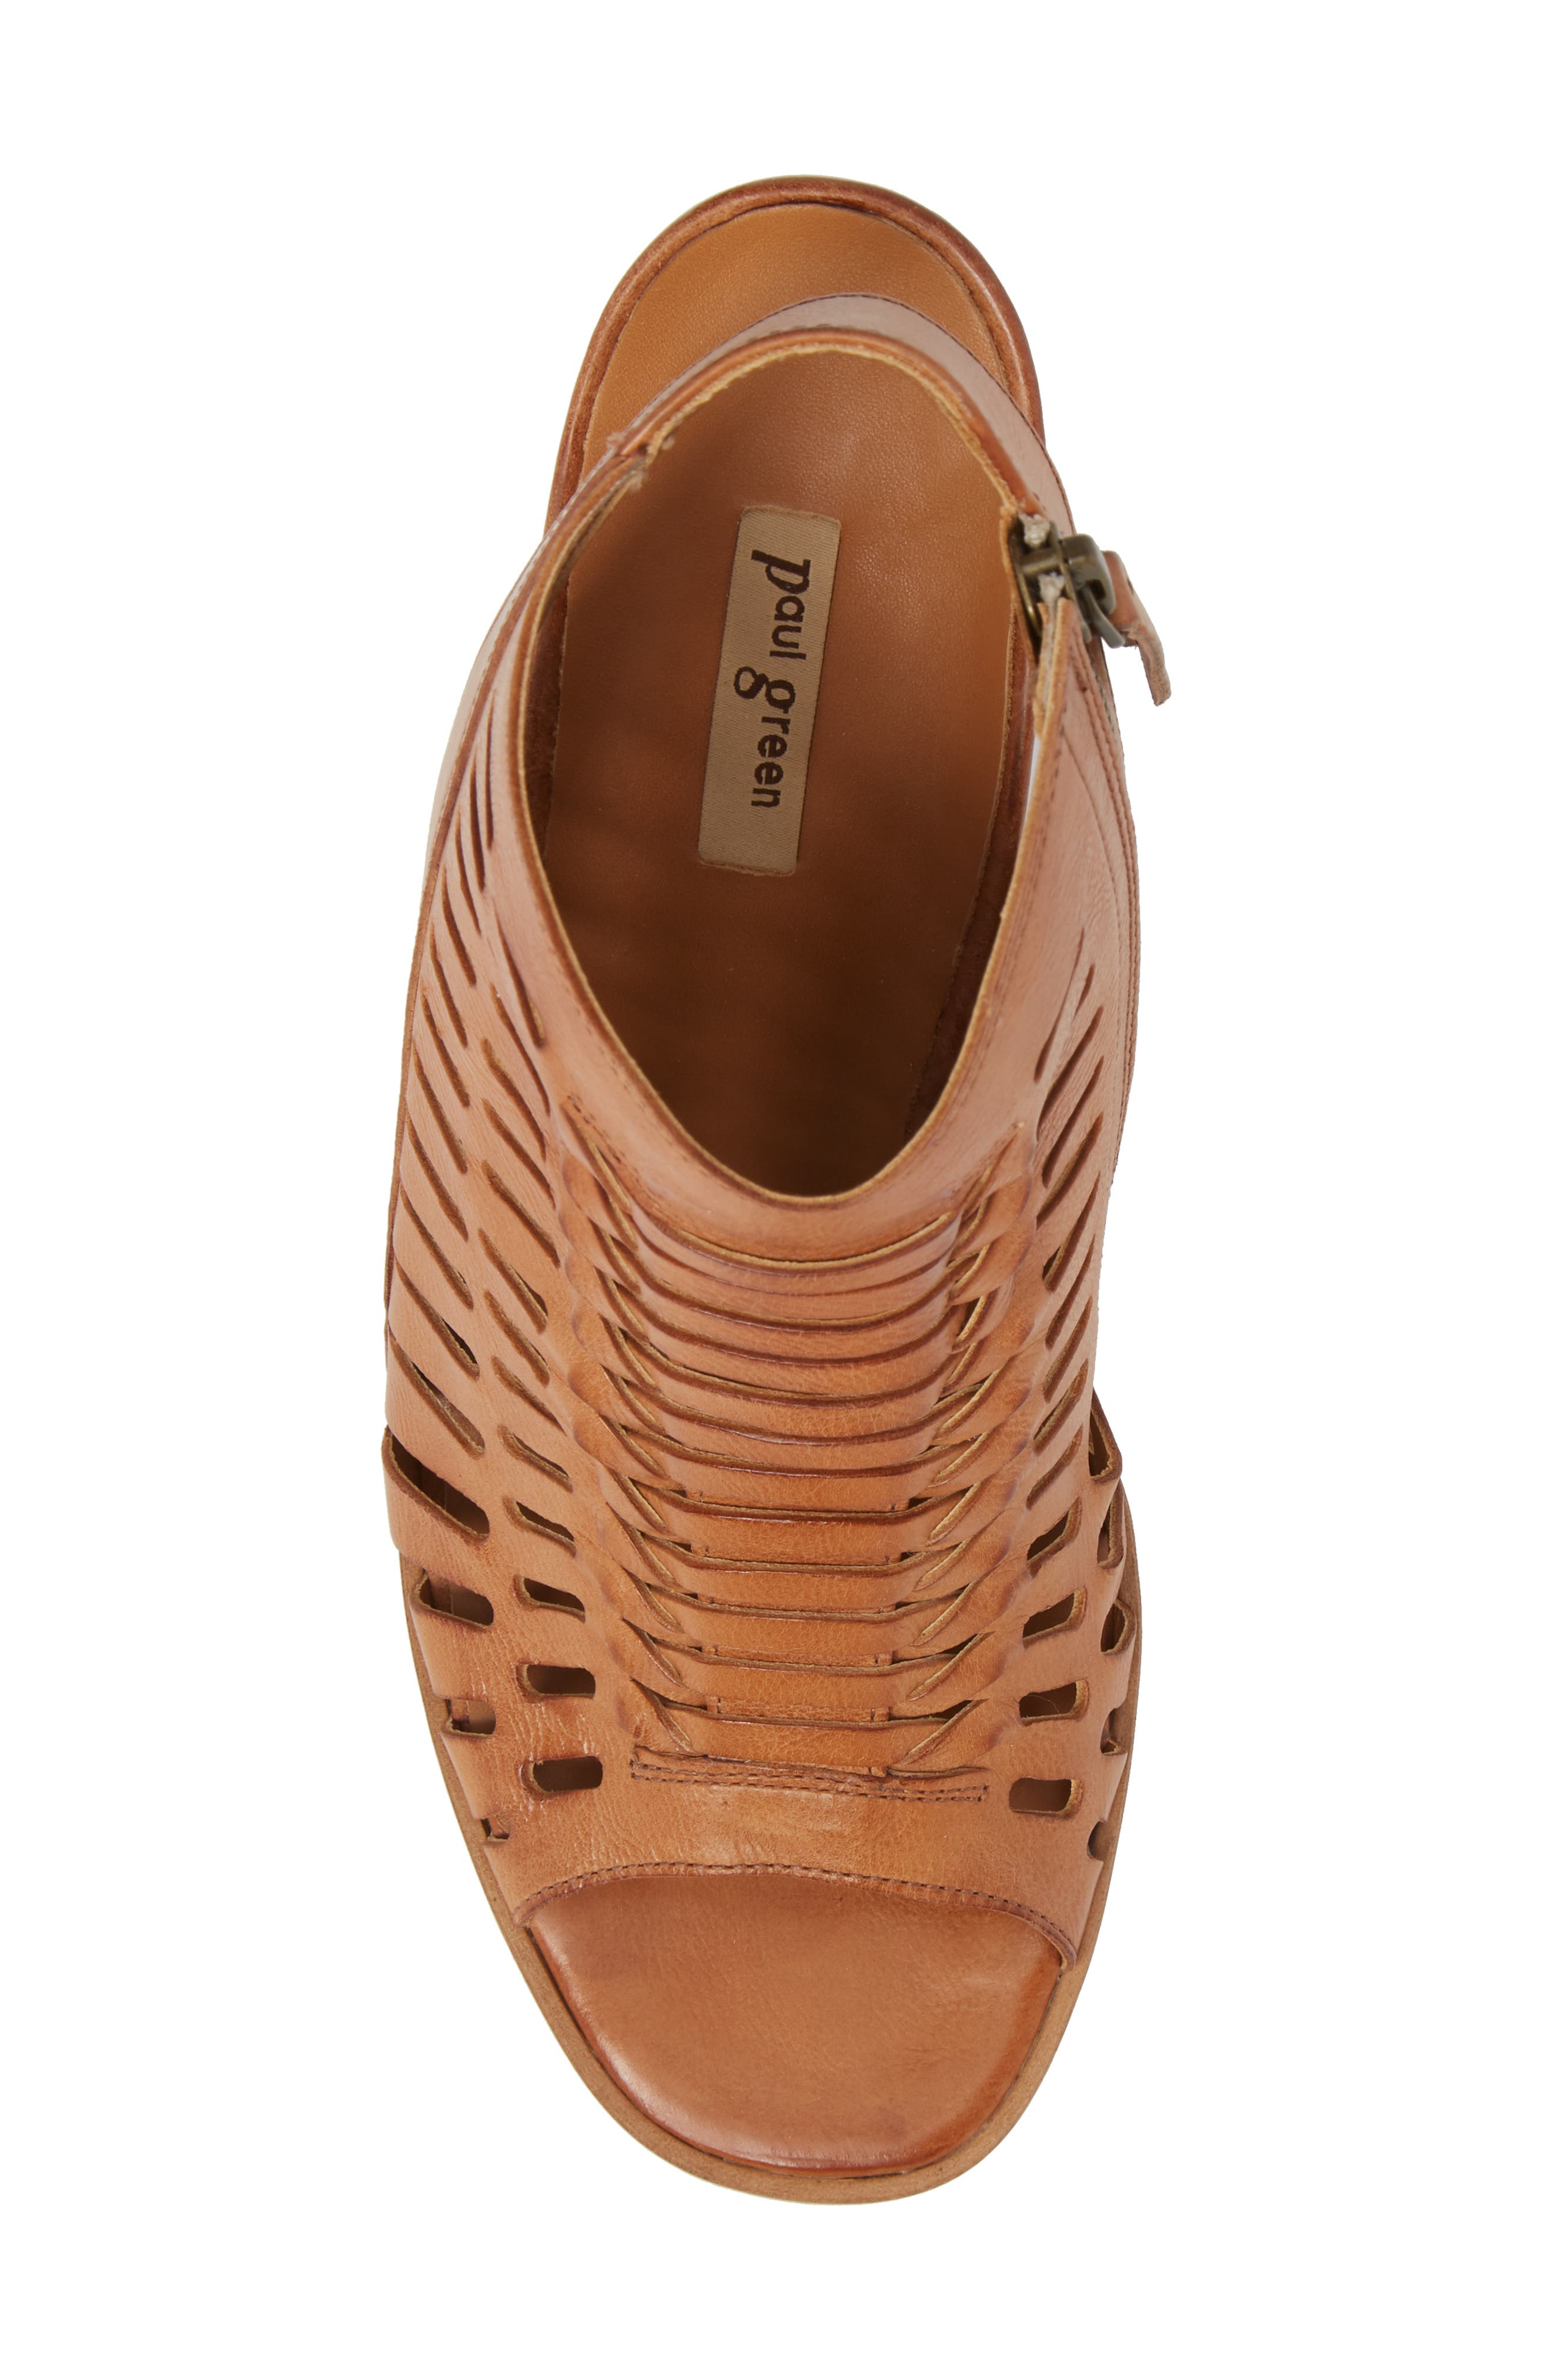 Rosa Woven Peep Toe Sandal,                             Alternate thumbnail 5, color,                             Cuoio Leather